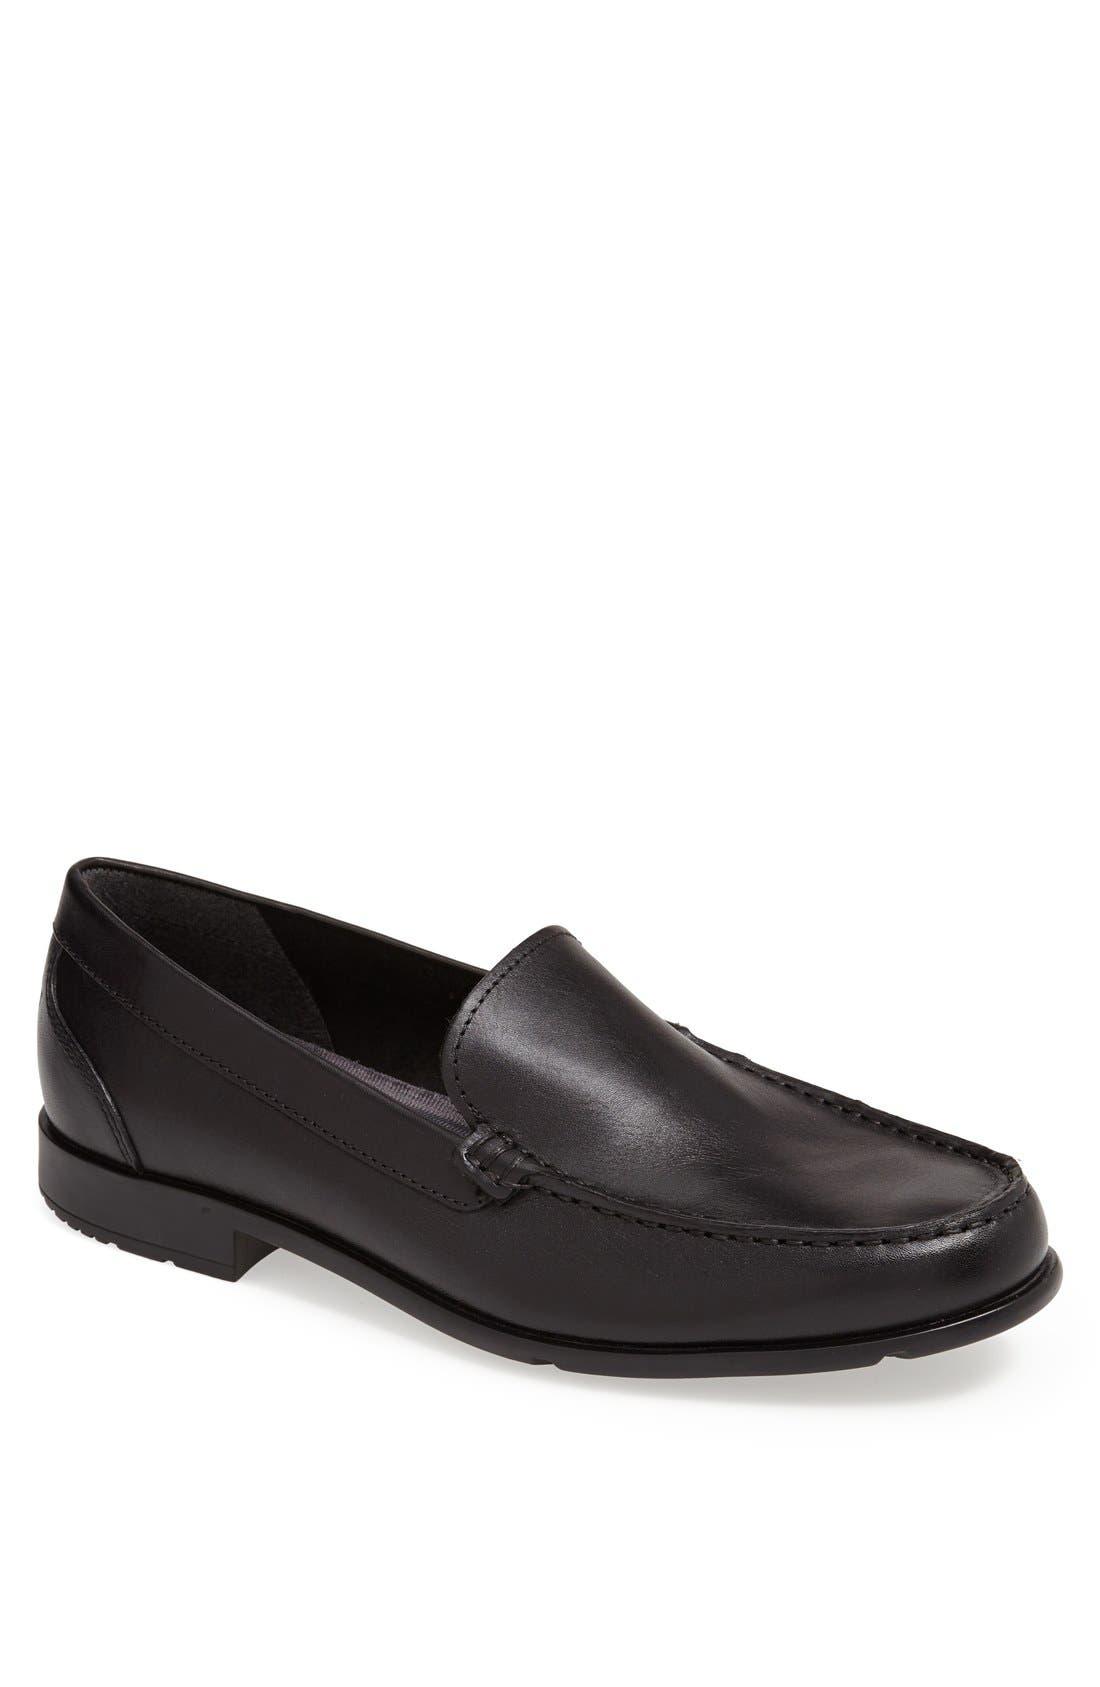 Alternate Image 1 Selected - Rockport Classic Venetian Loafer (Men)